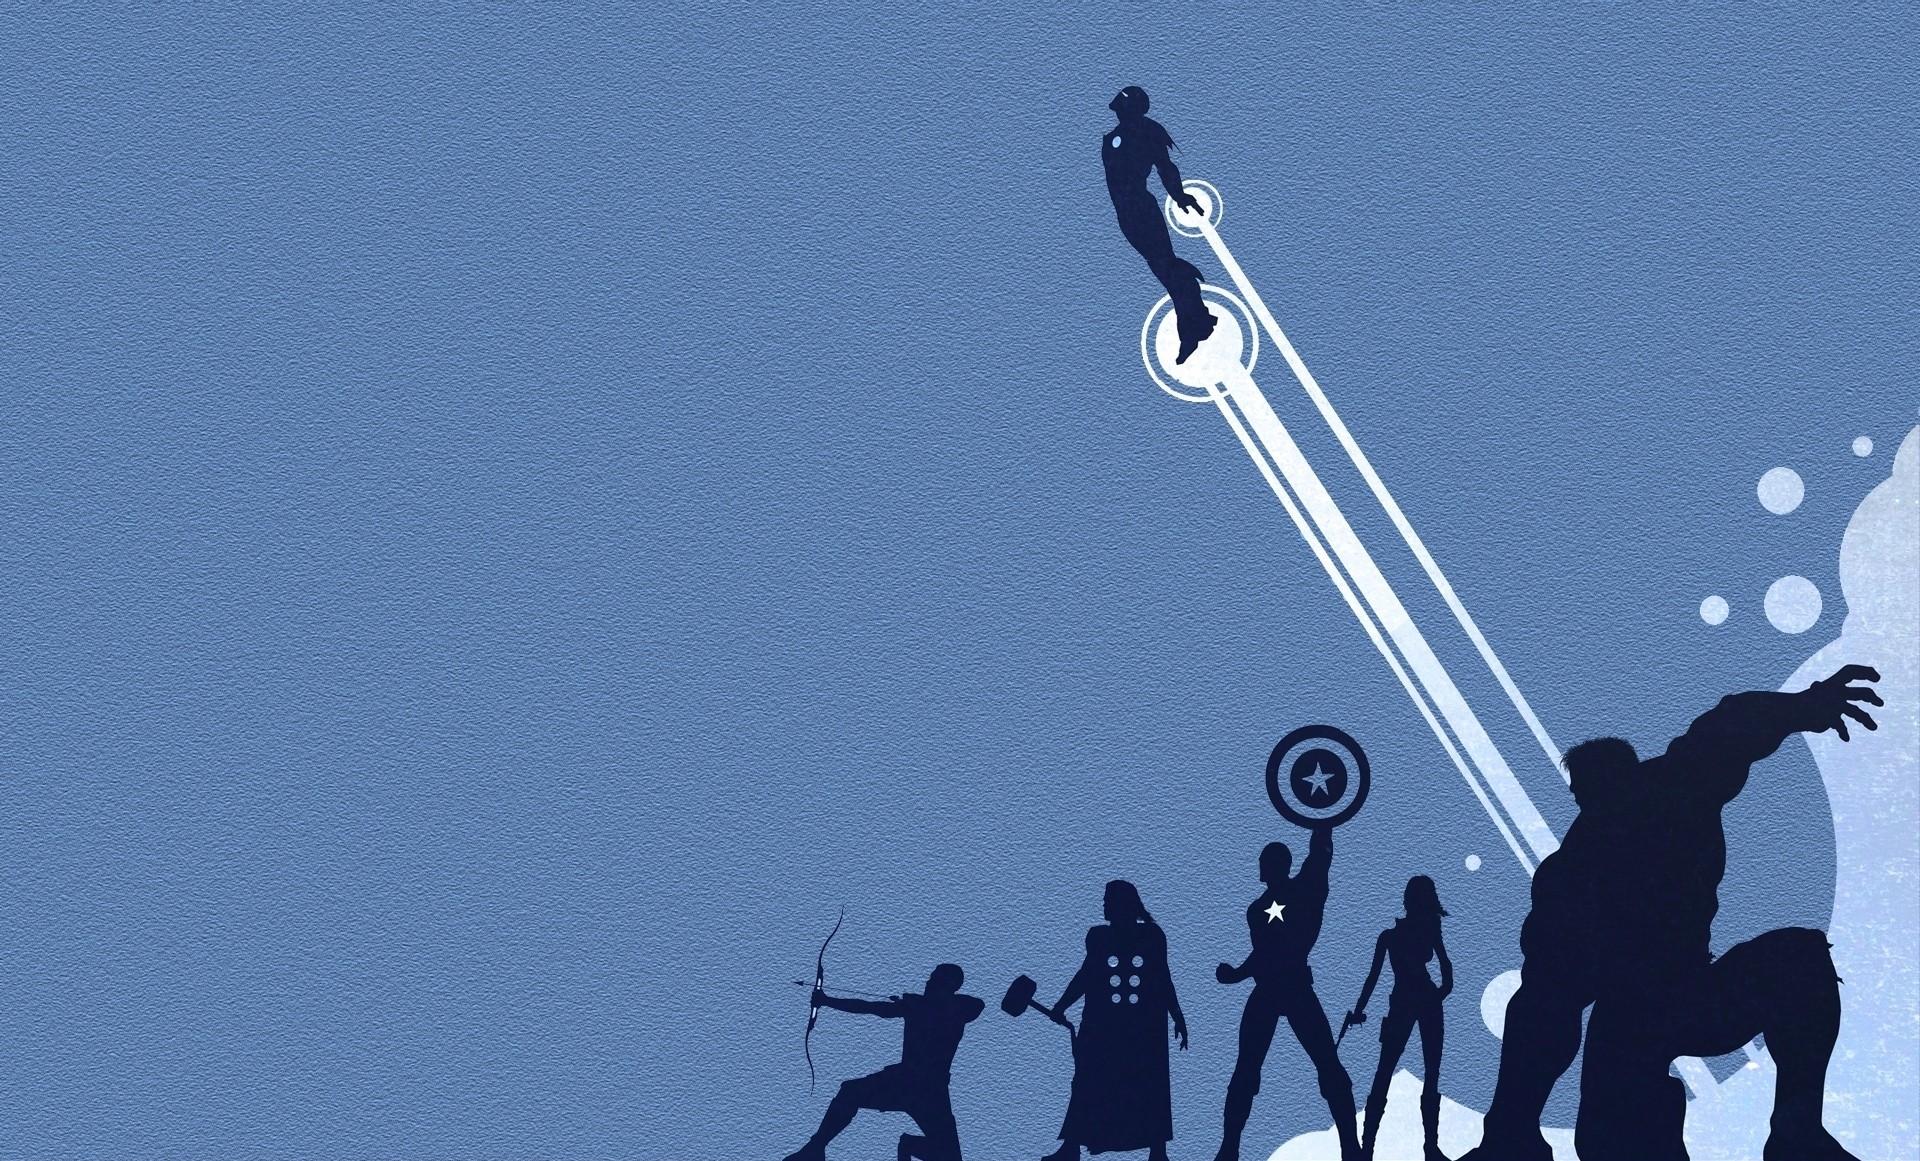 Wonderful Wallpaper Marvel Hawkeye - sports-Thor-jumping-artwork-silhouette-blue-Marvel-Comics-Iron-Man-Hulk-Captain-America-The-Avengers-Black-Widow-snowboard-Hawkeye-Ski-extreme-sport-winter-sport-ski-equipment-259389  Picture_268142.jpg